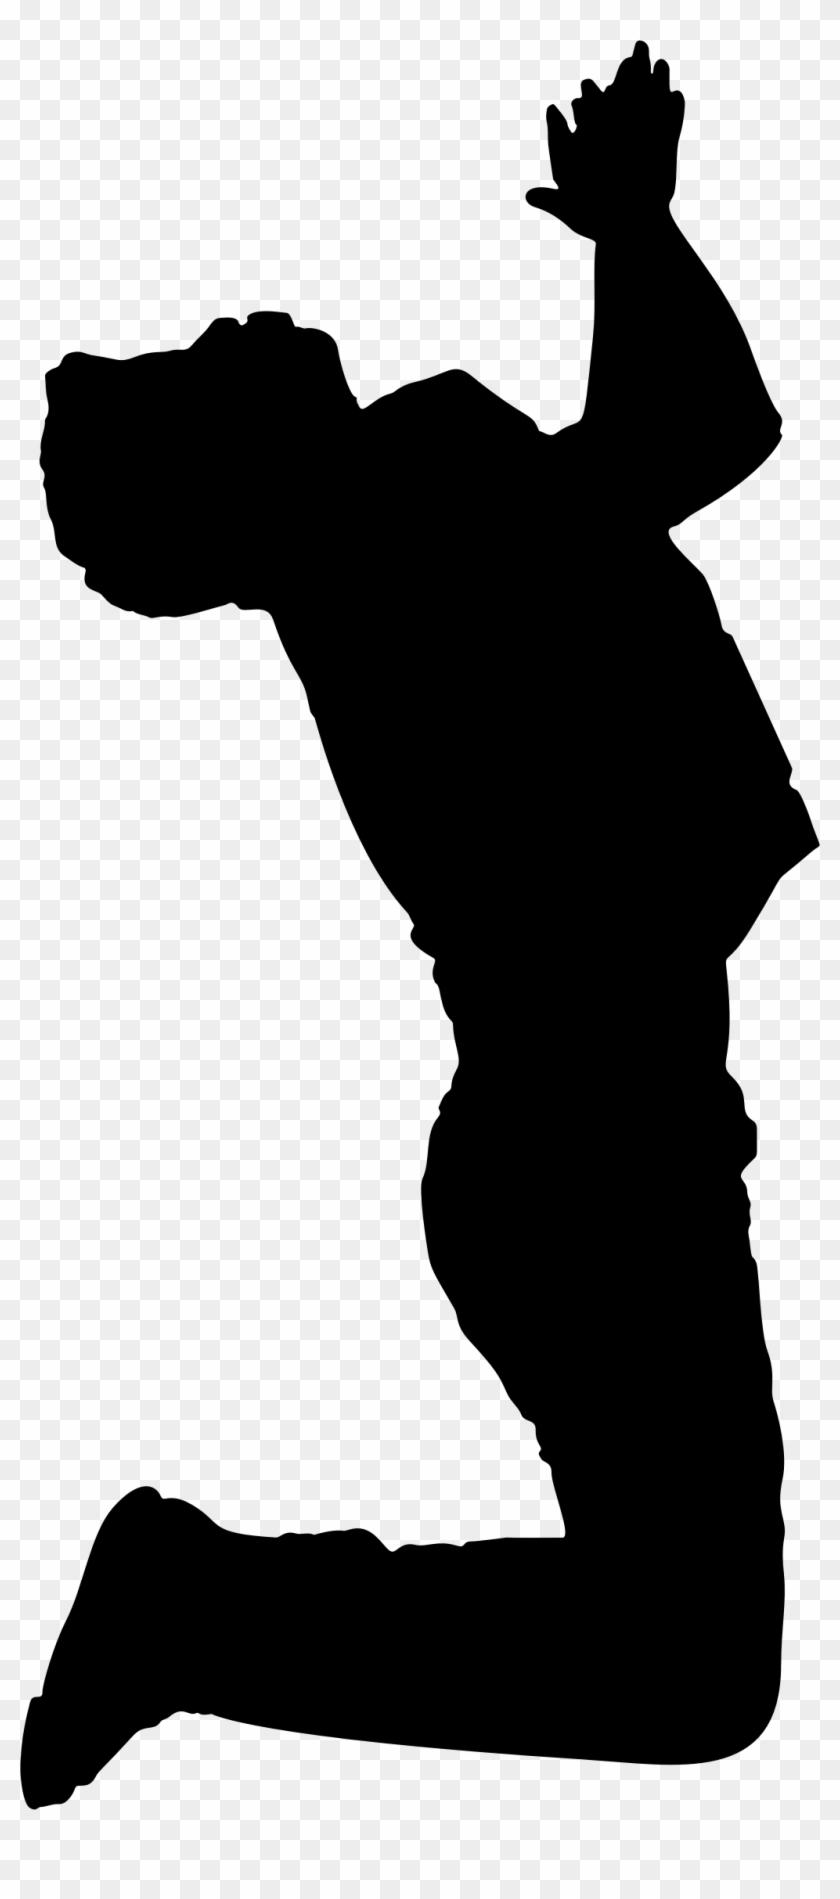 Clipart - Praying Man Silhouette #114004